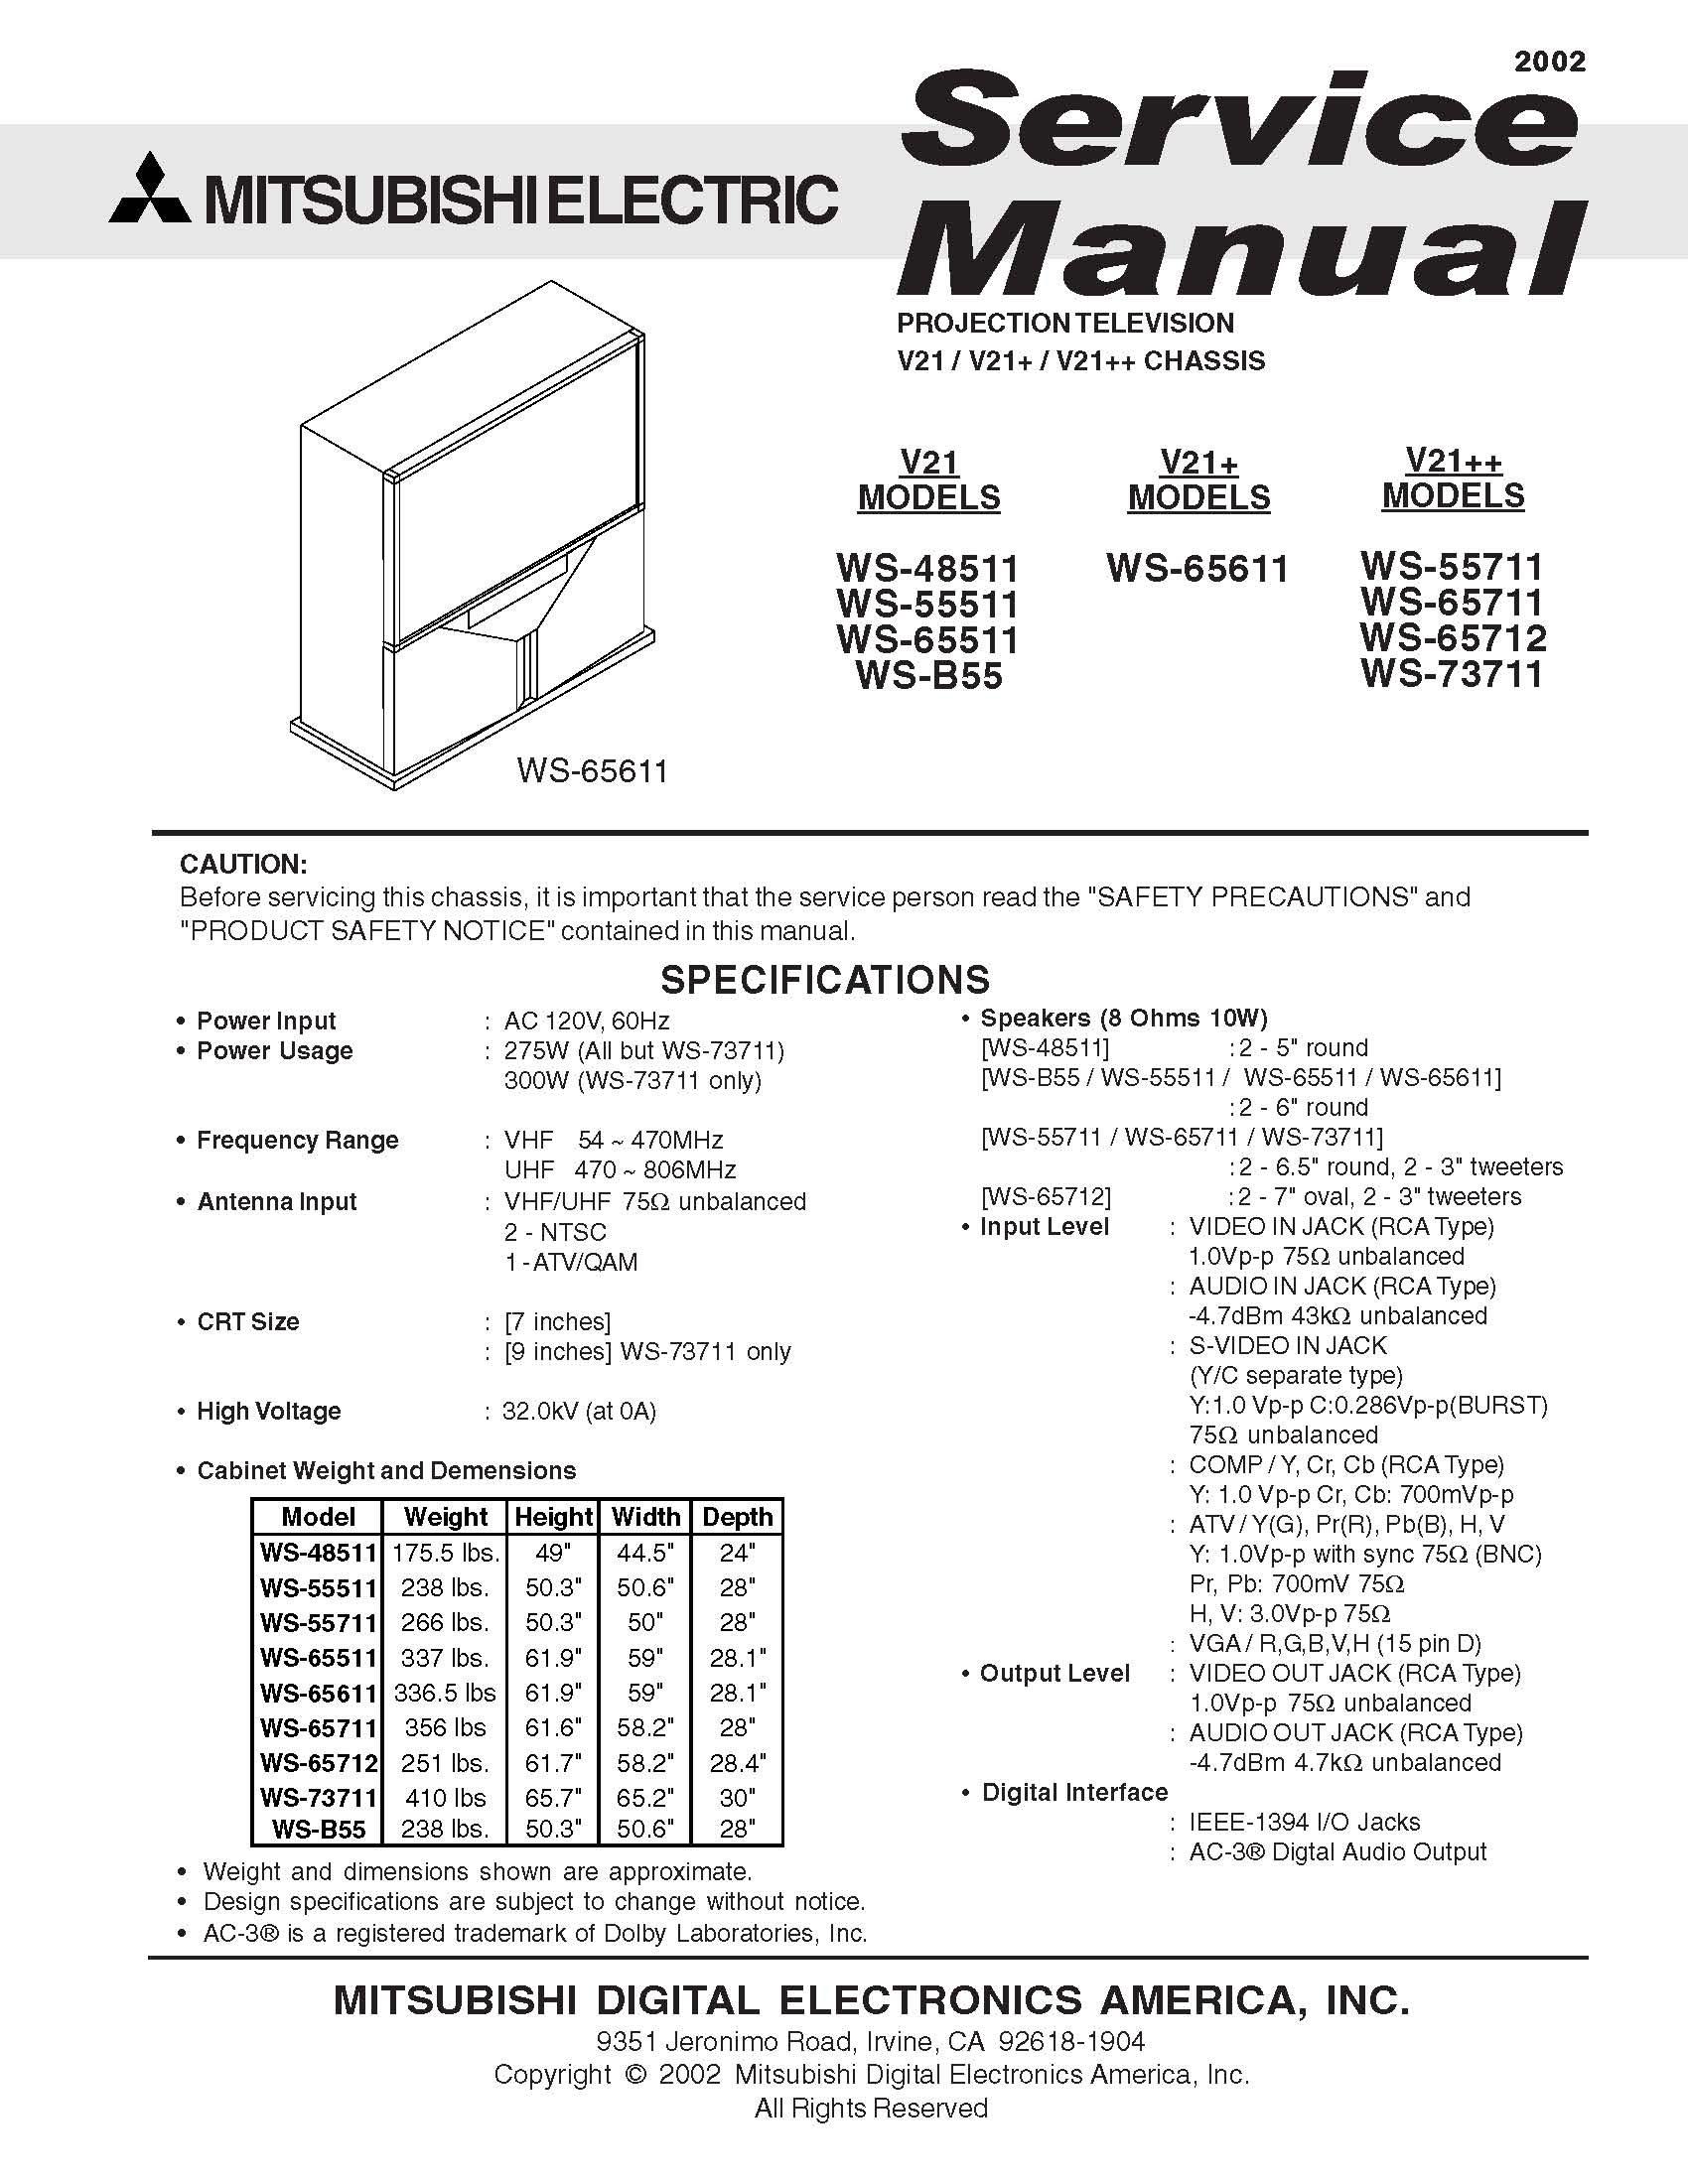 mitsubishi tv service manual enthusiast wiring diagrams u2022 rh rasalibre co mitsubishi ws-55315 service manual Mitsubishi TV WS-55315